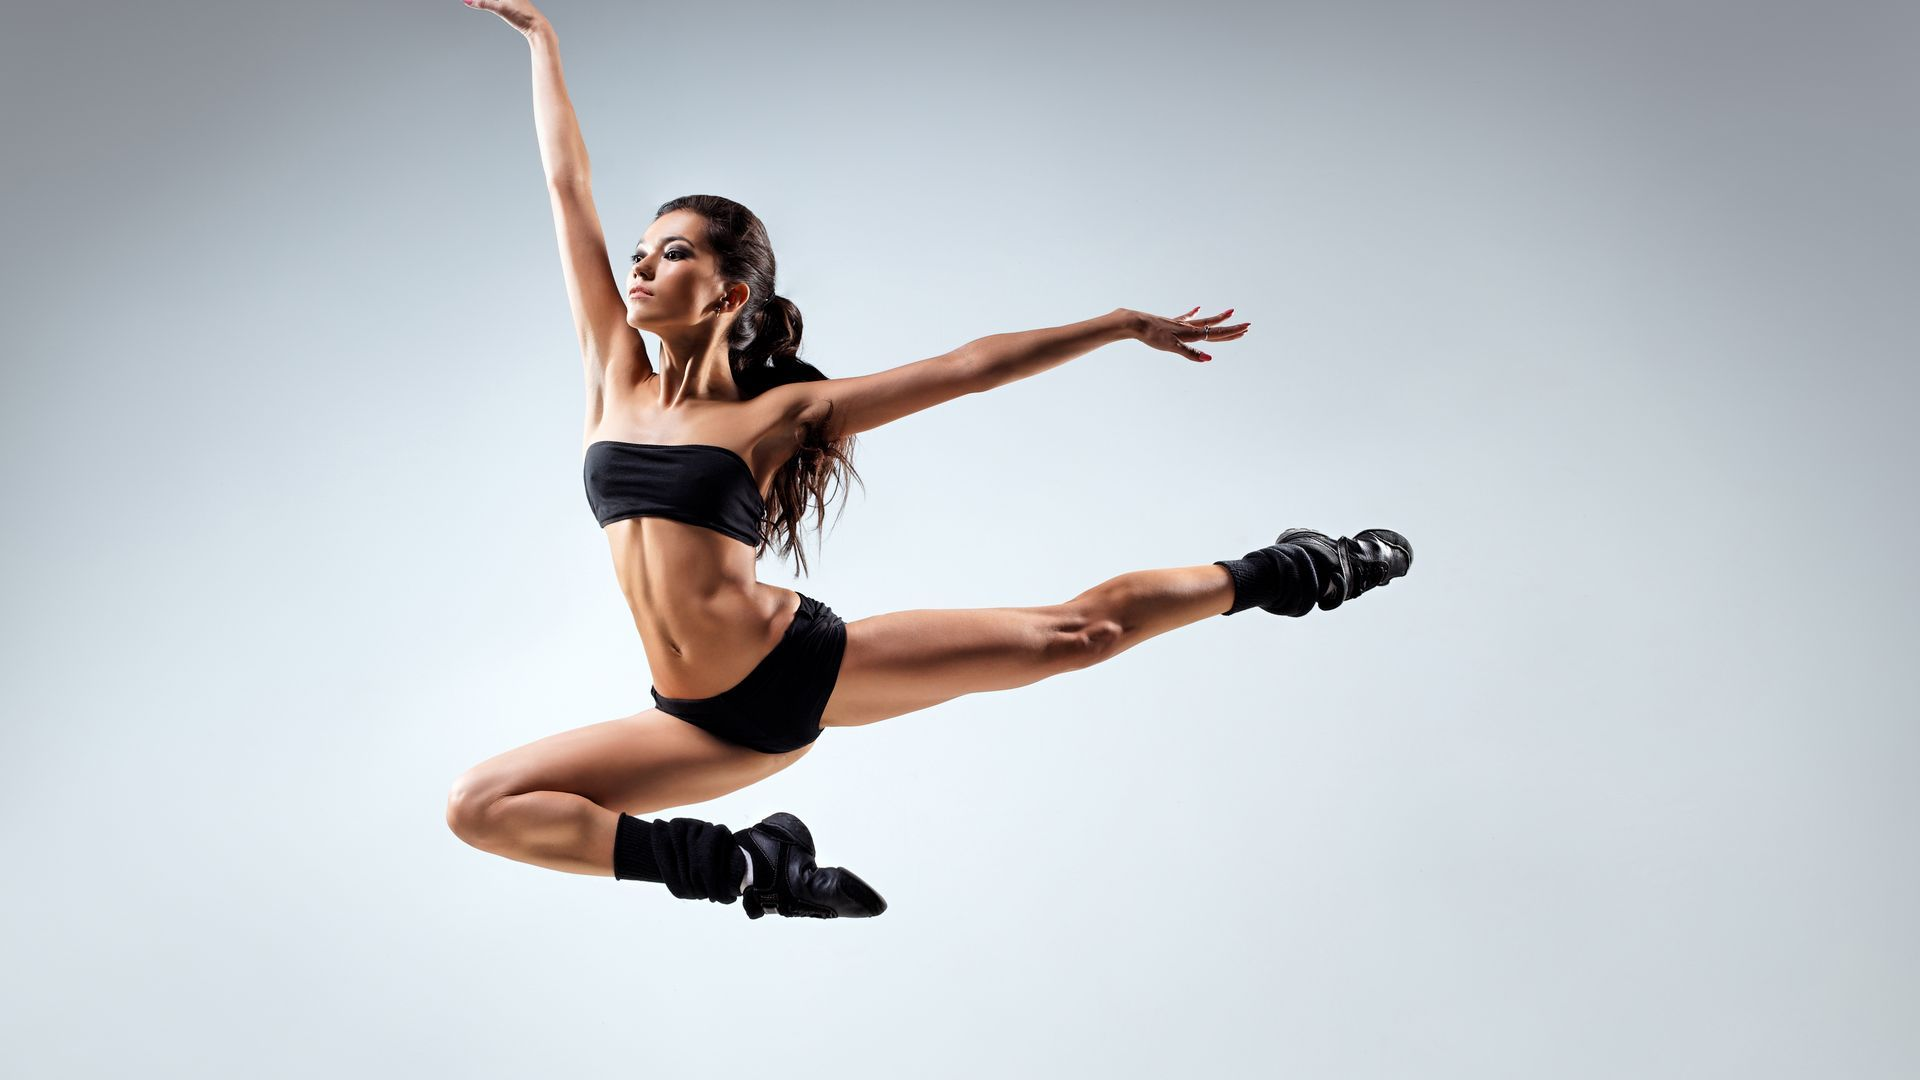 Dance free hd wallpaper